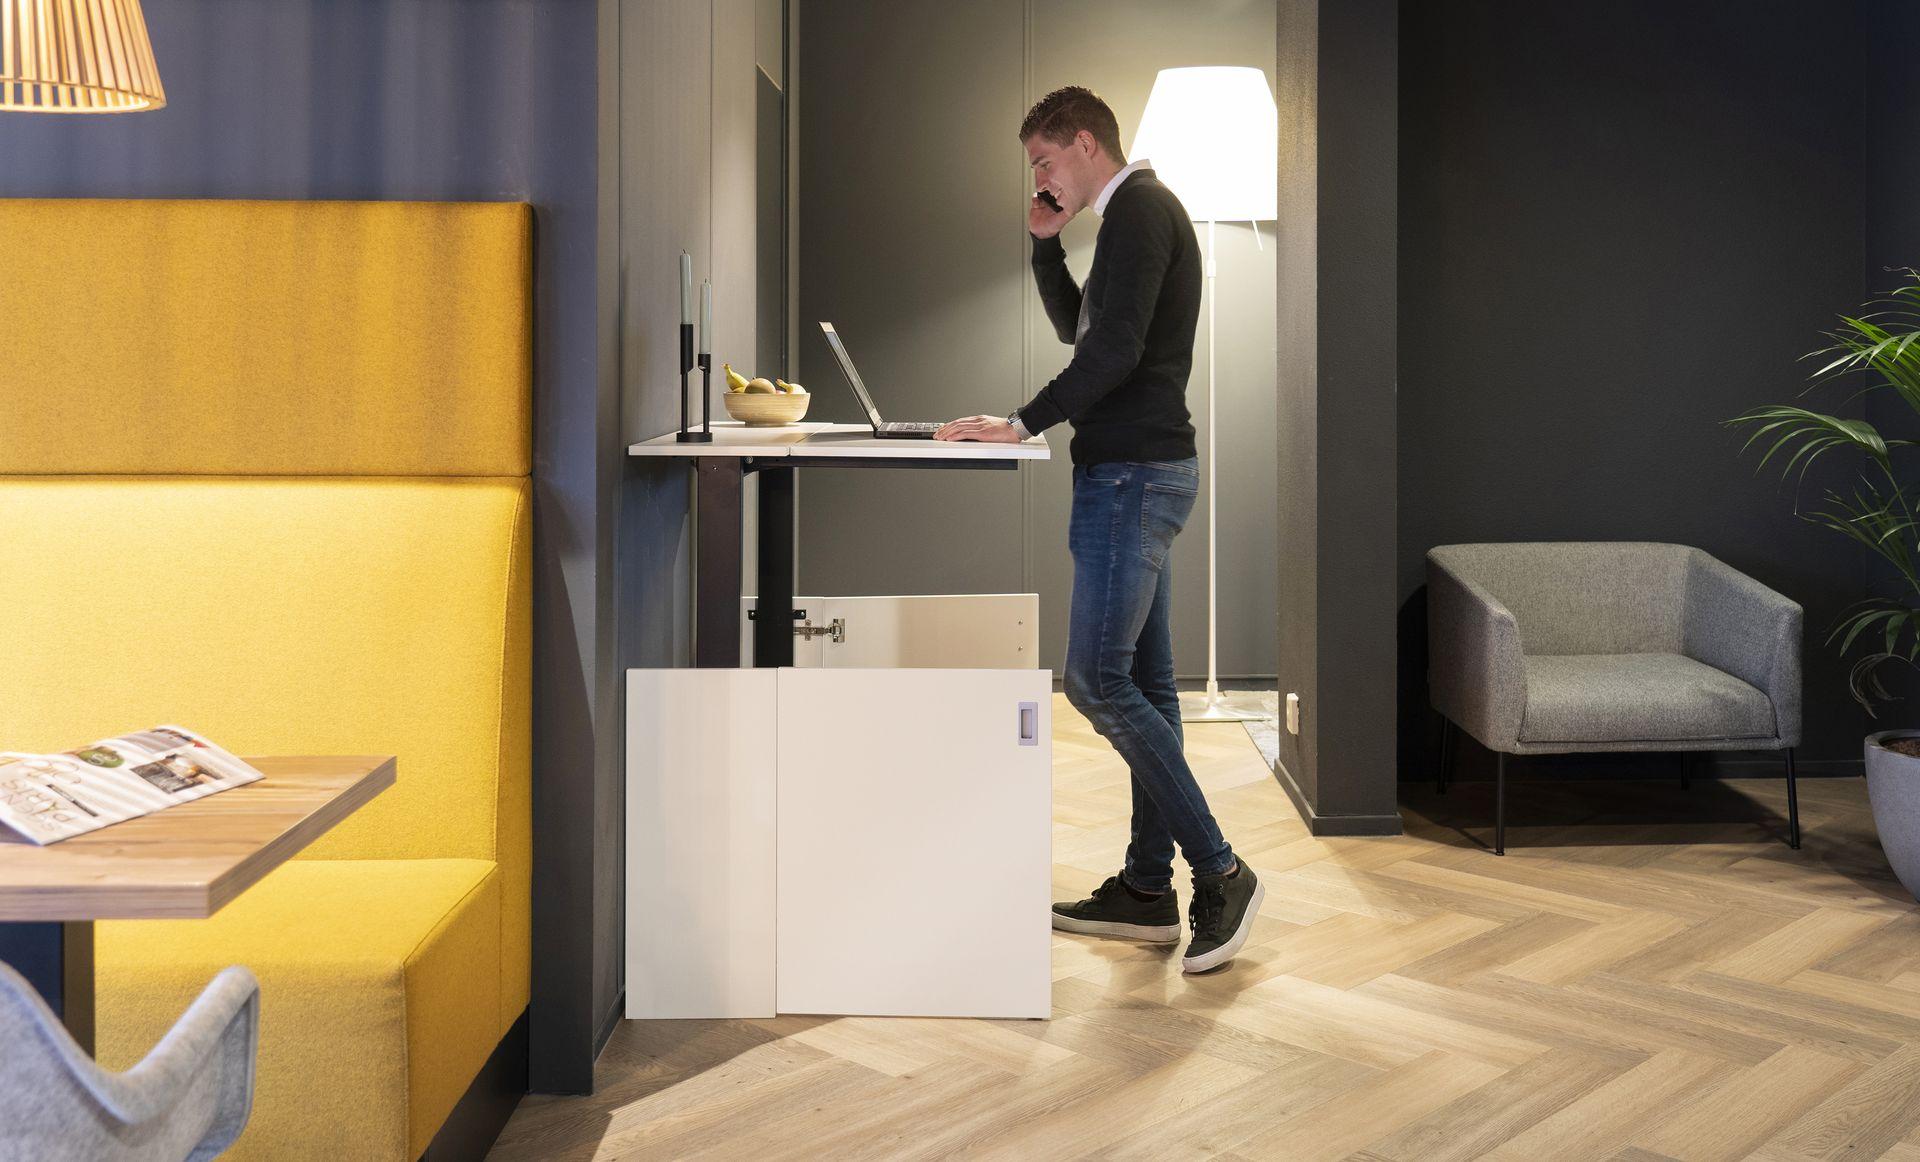 Home-Fit-Zitstawerkplek-Thuiskantoor-Zit-staand-werken-HomeOffice-Loff